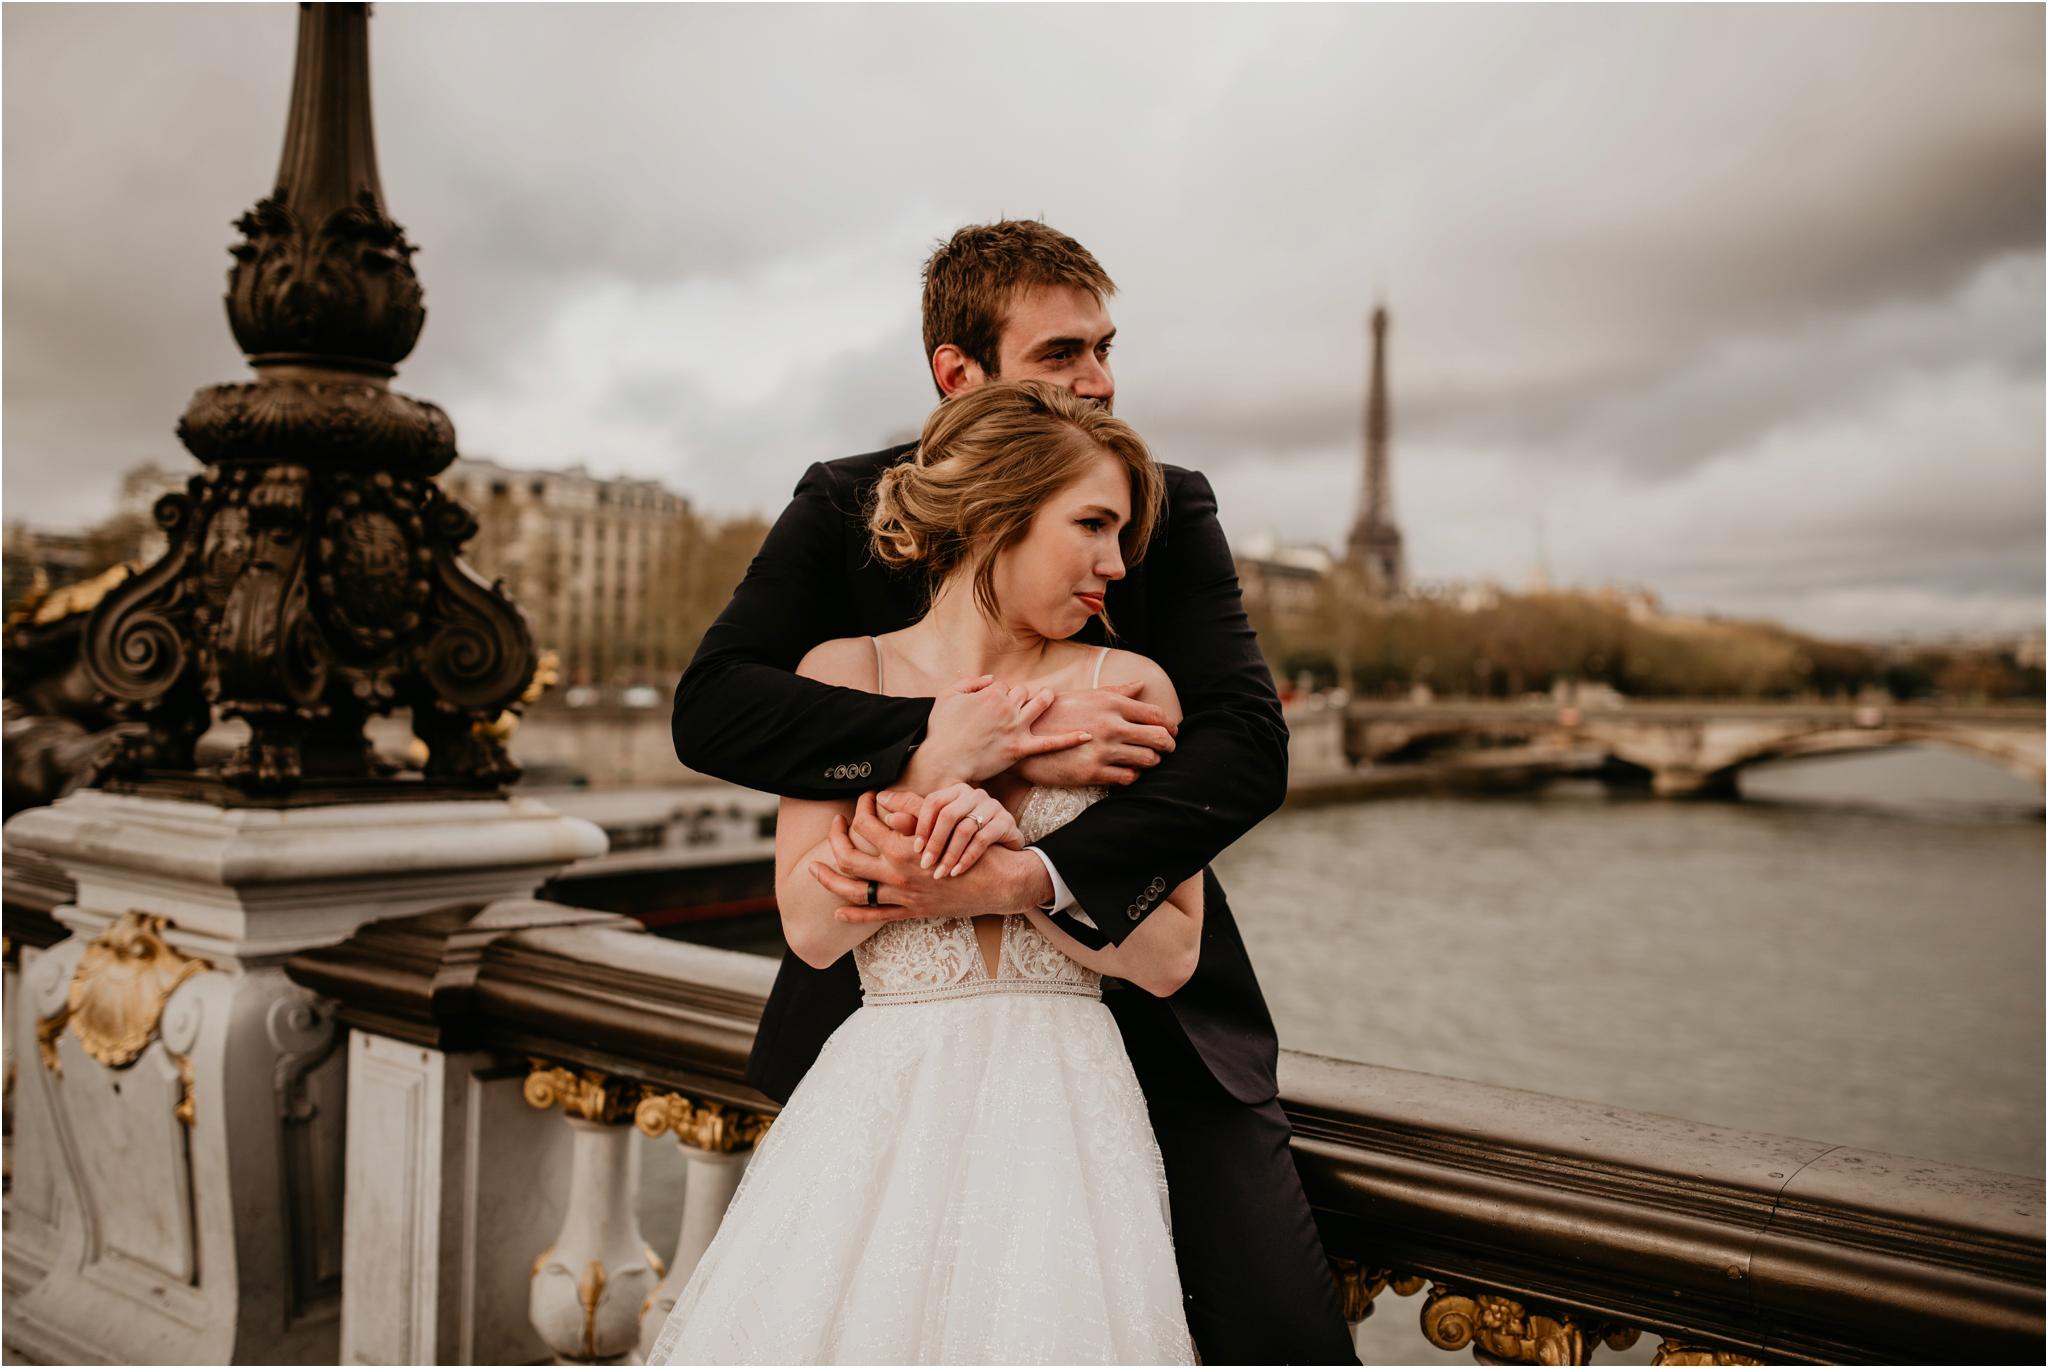 miranda-and-jared-paris-elopement-destination-wedding-photographer-082.jpg